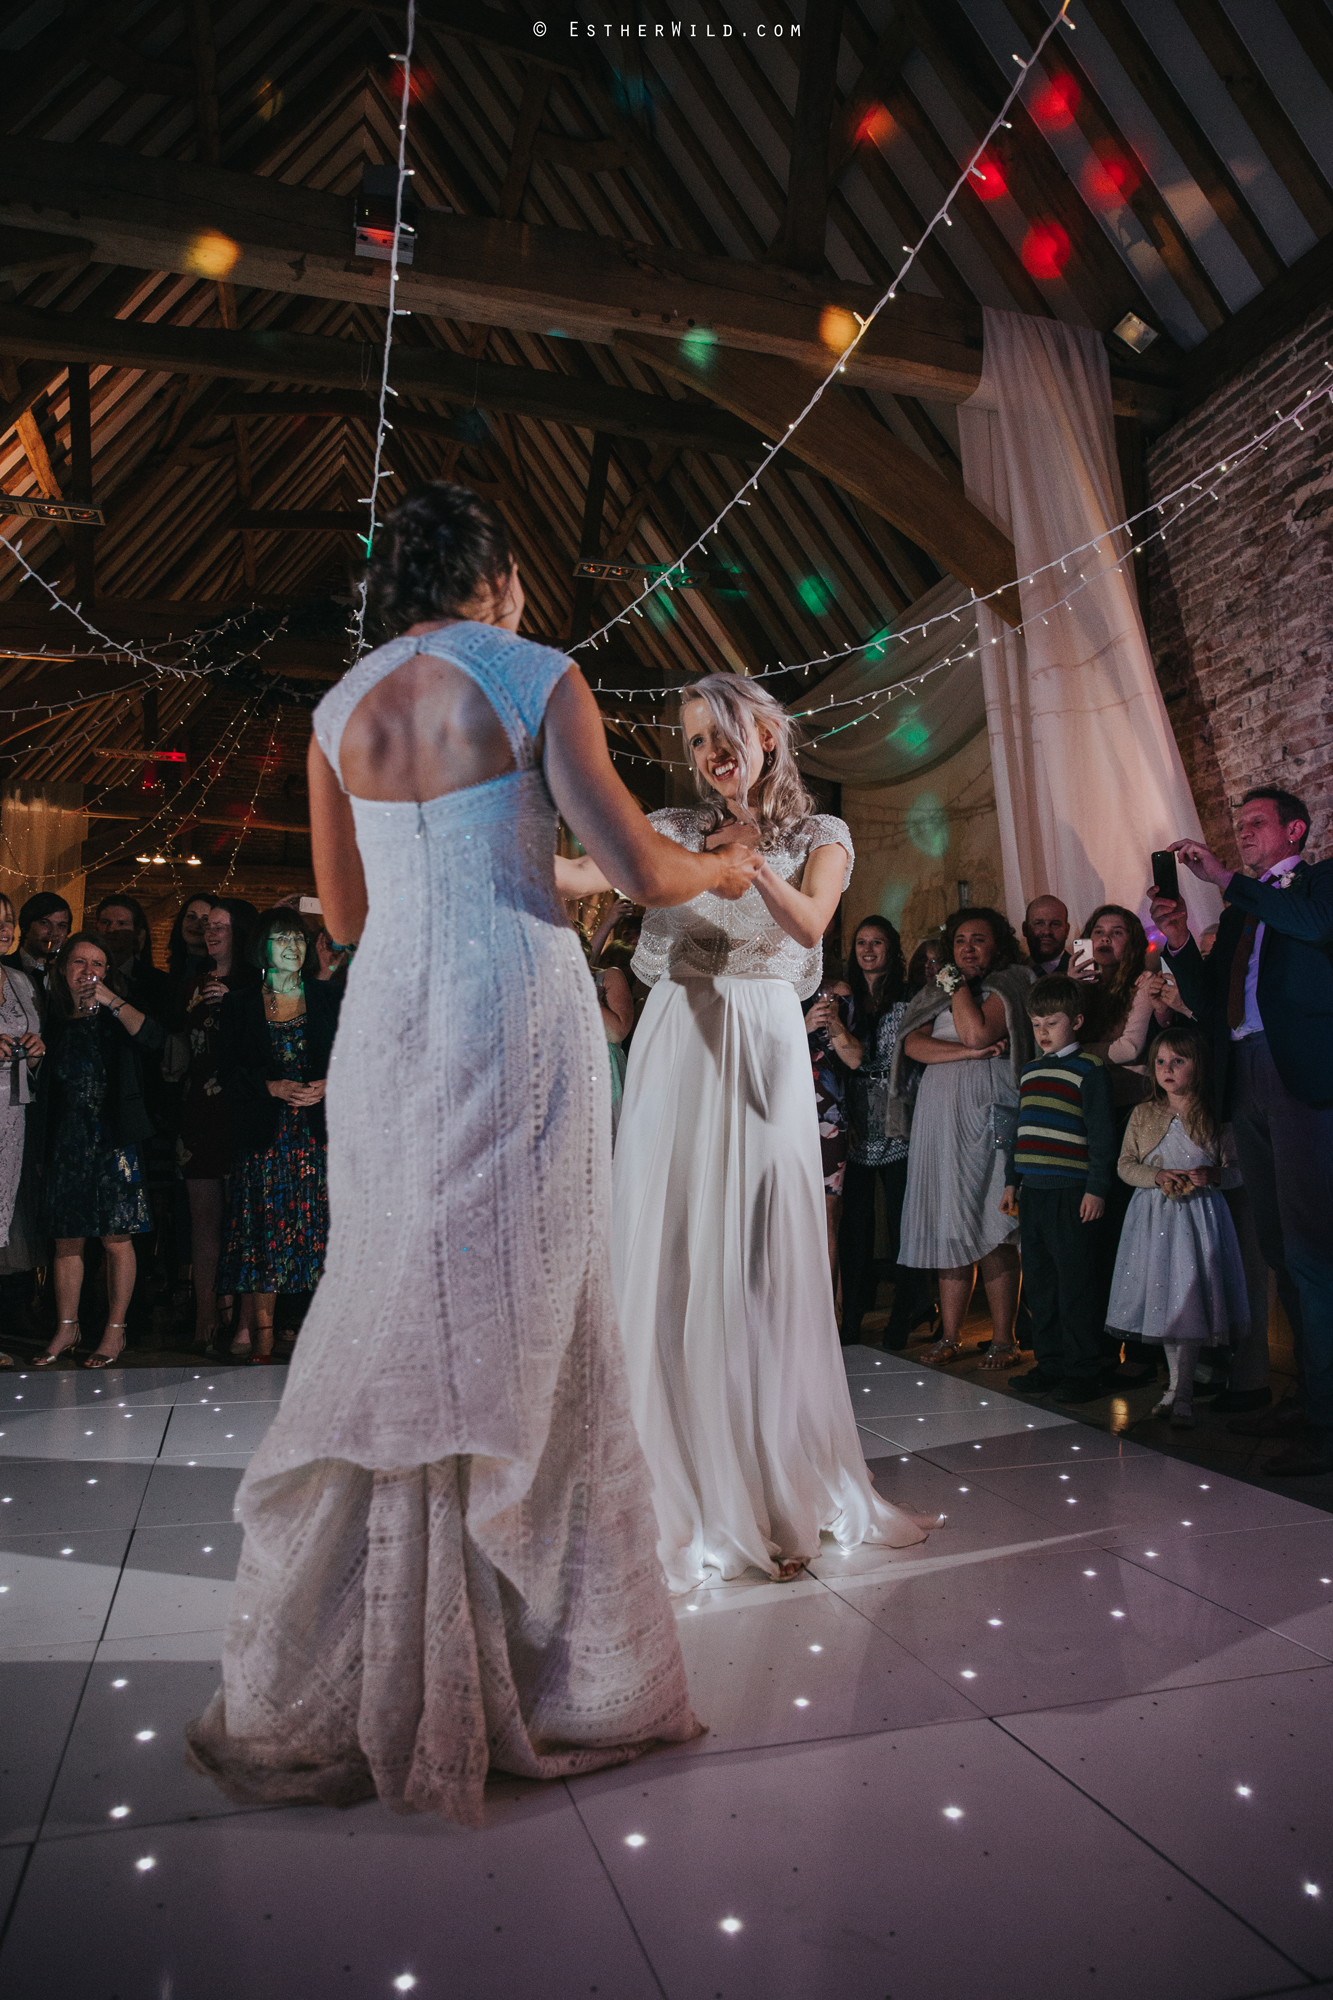 Elms_Barn_Weddings_Suffolk_Photographer_Copyright_Esther_Wild_IMG_3381.jpg